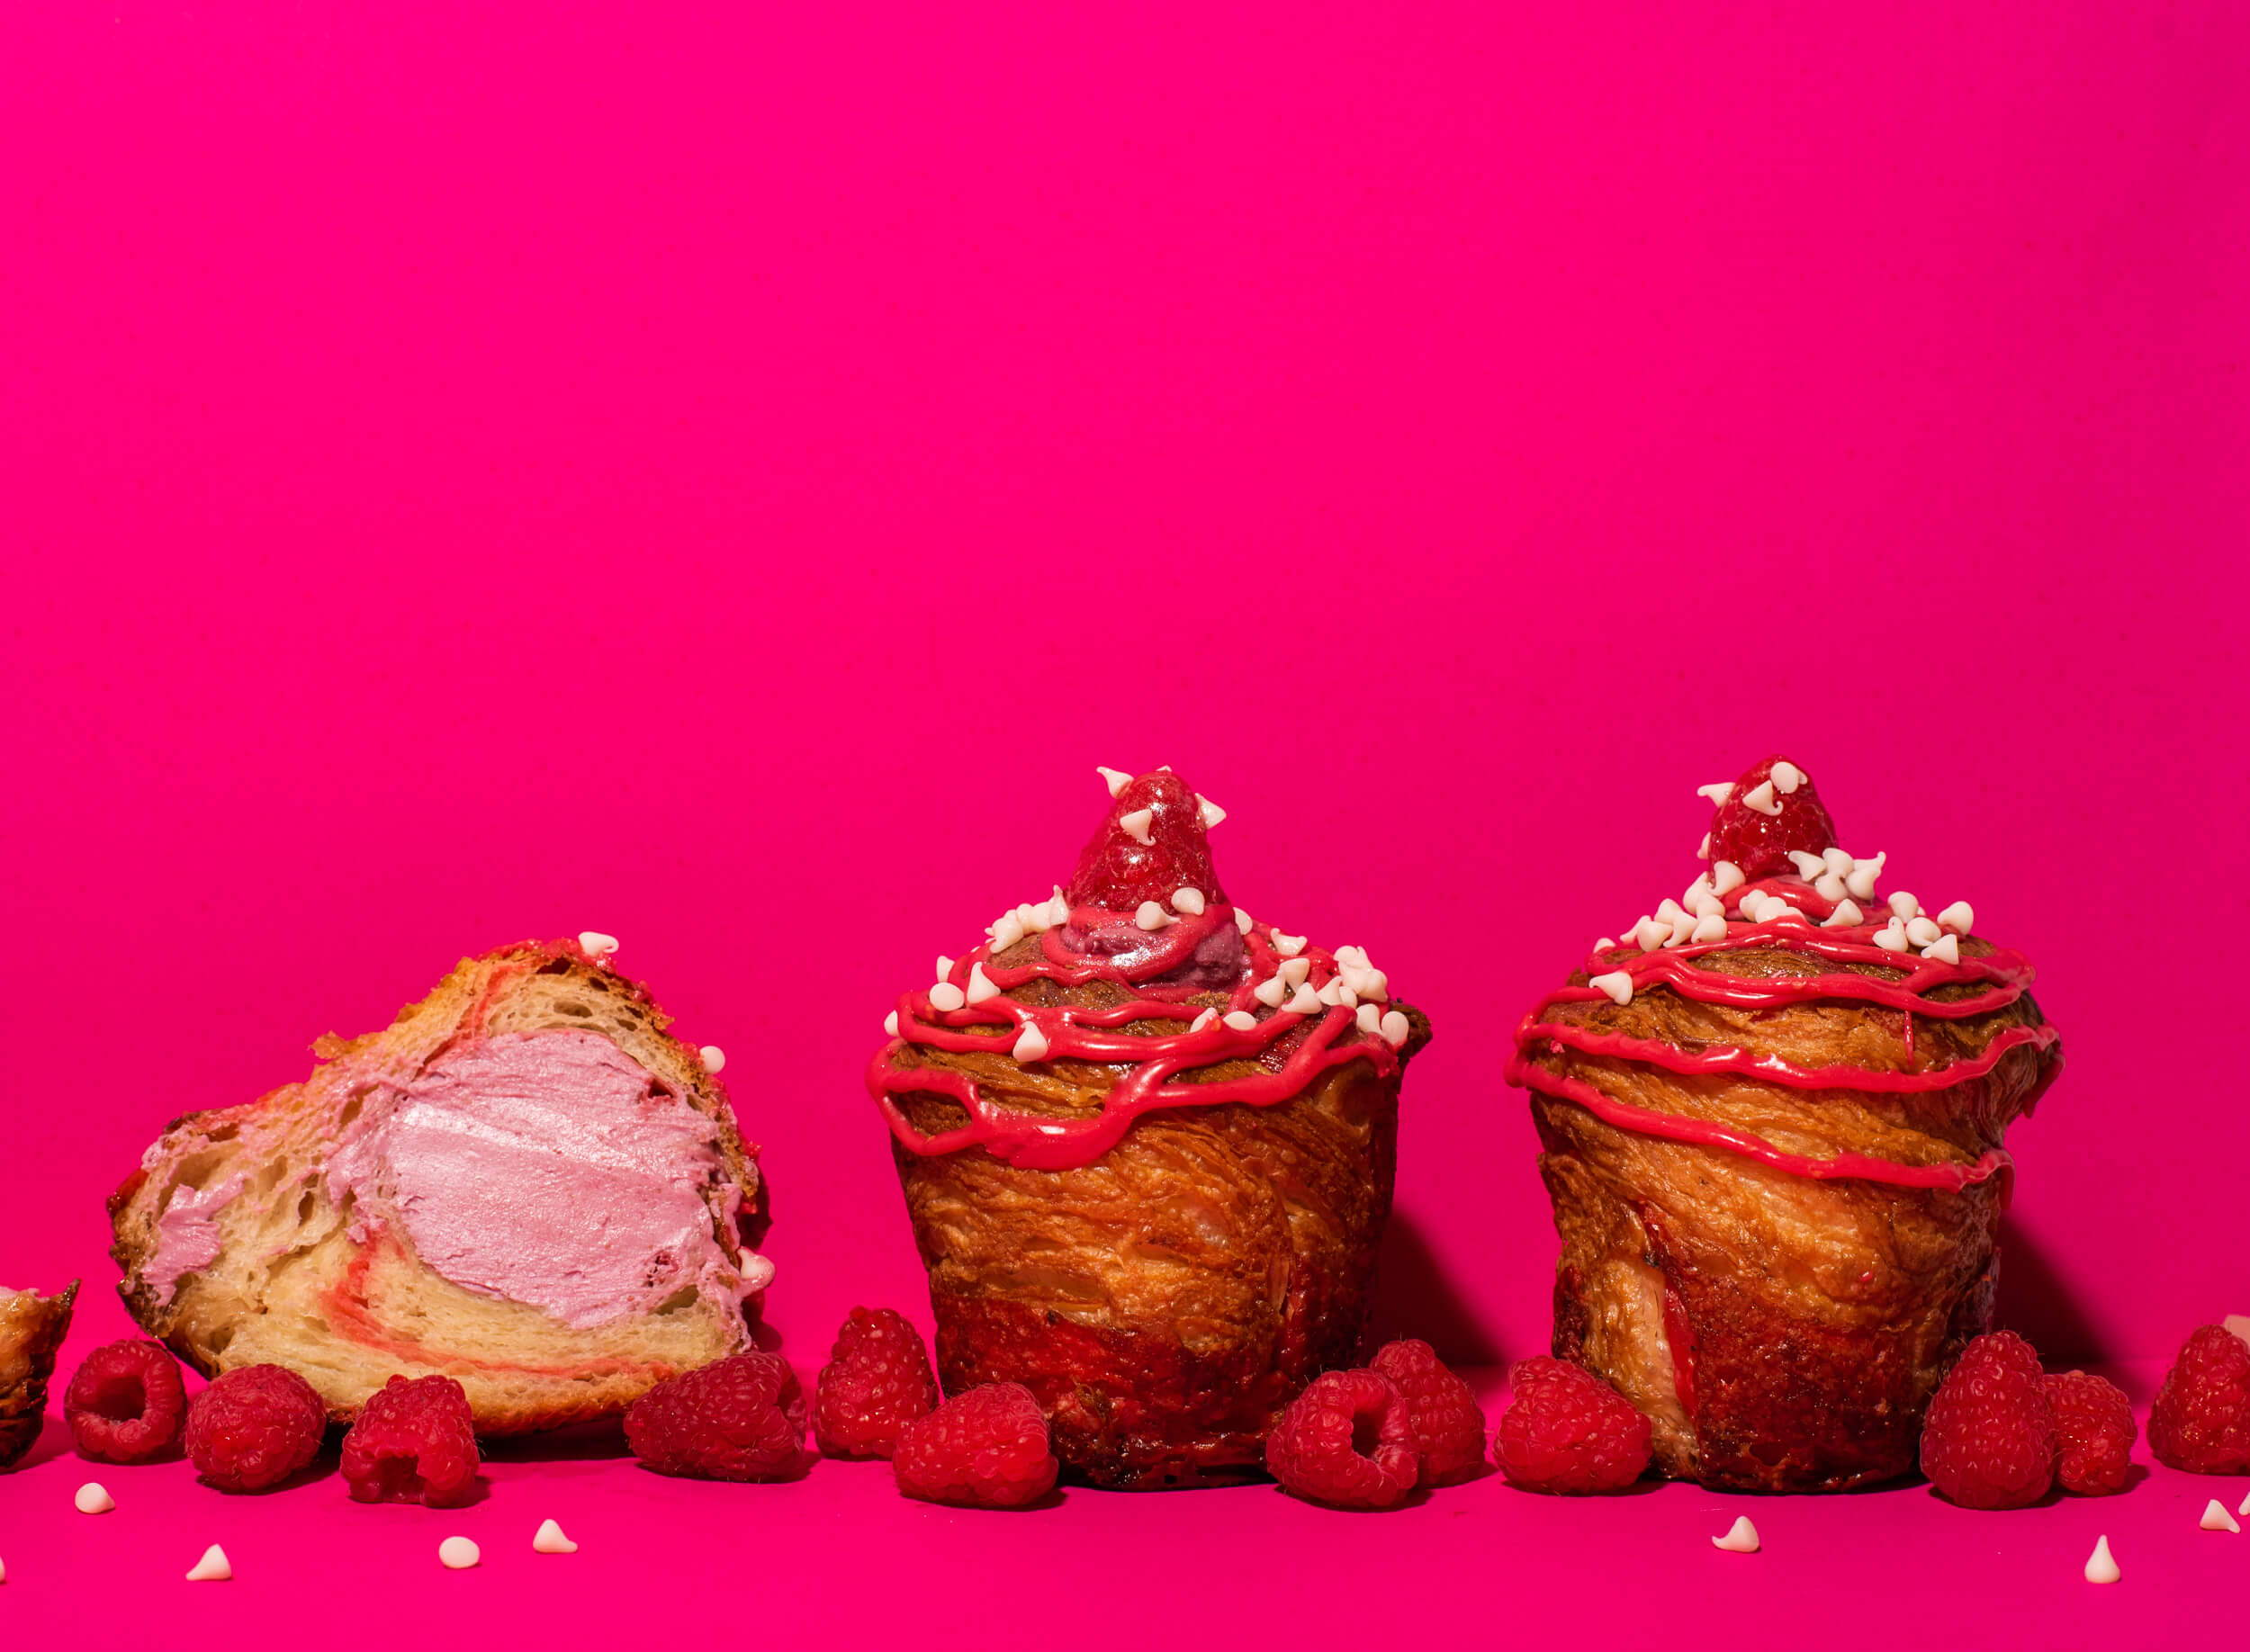 raspberry croissant cruffin vegan